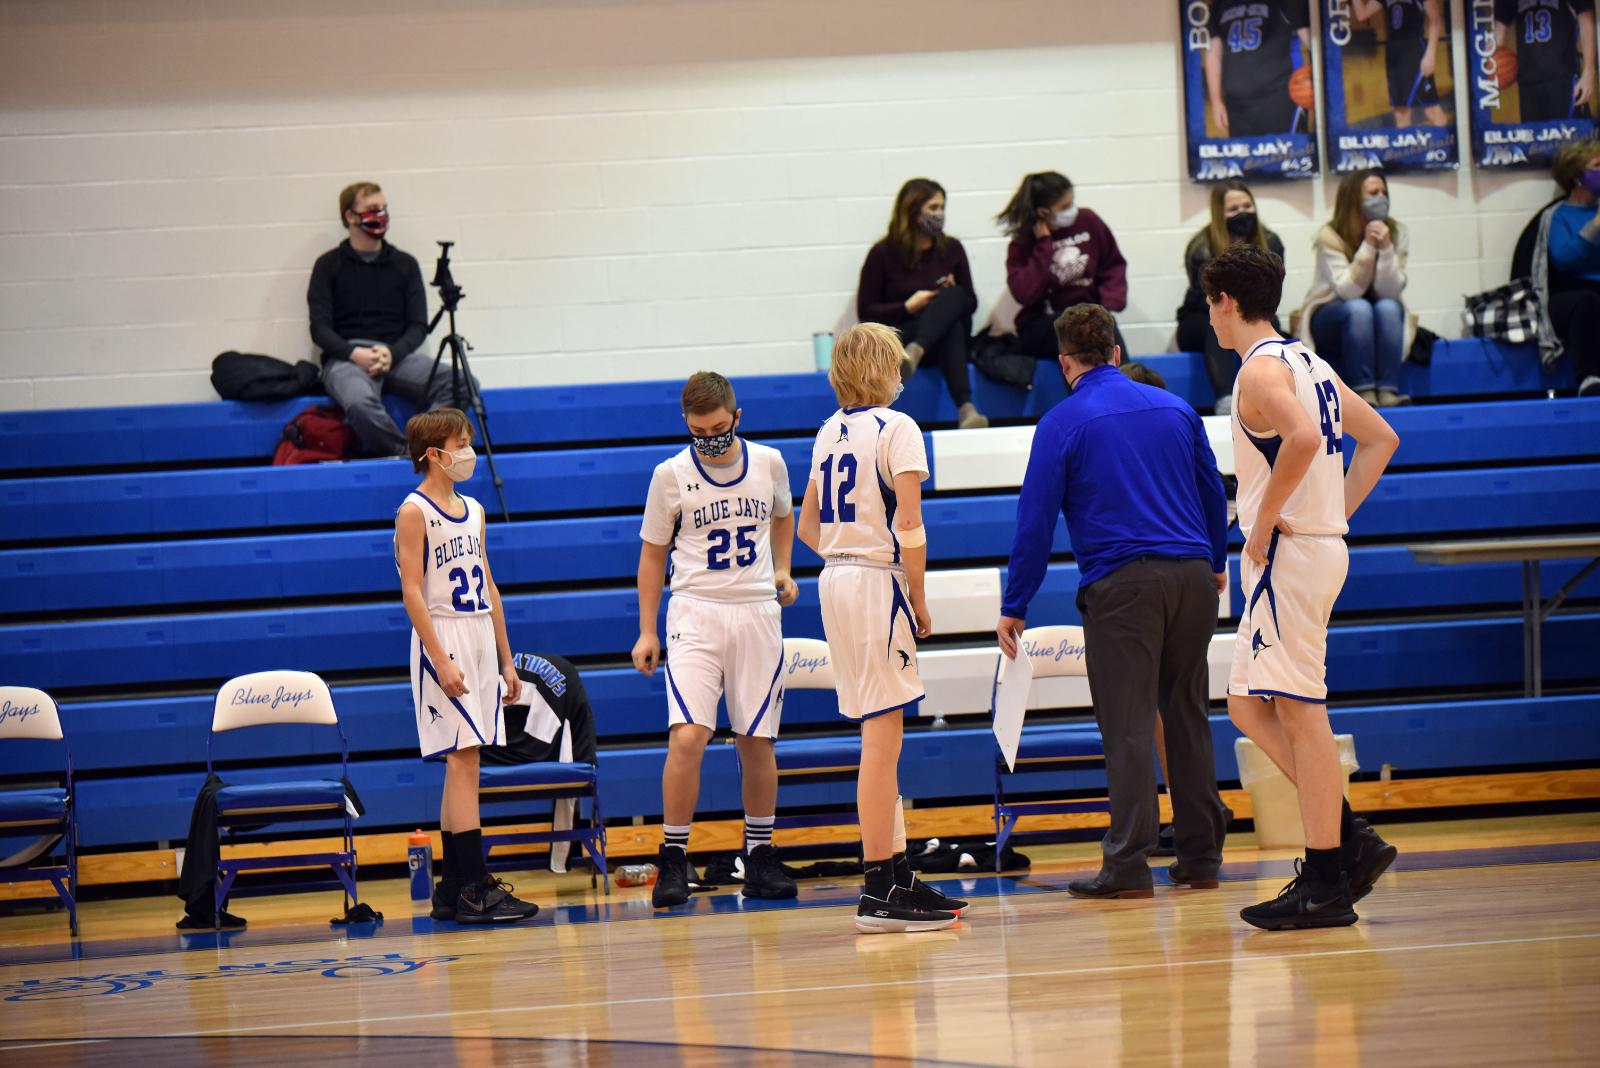 Boy's high school Basketball Jan. 12, 2021